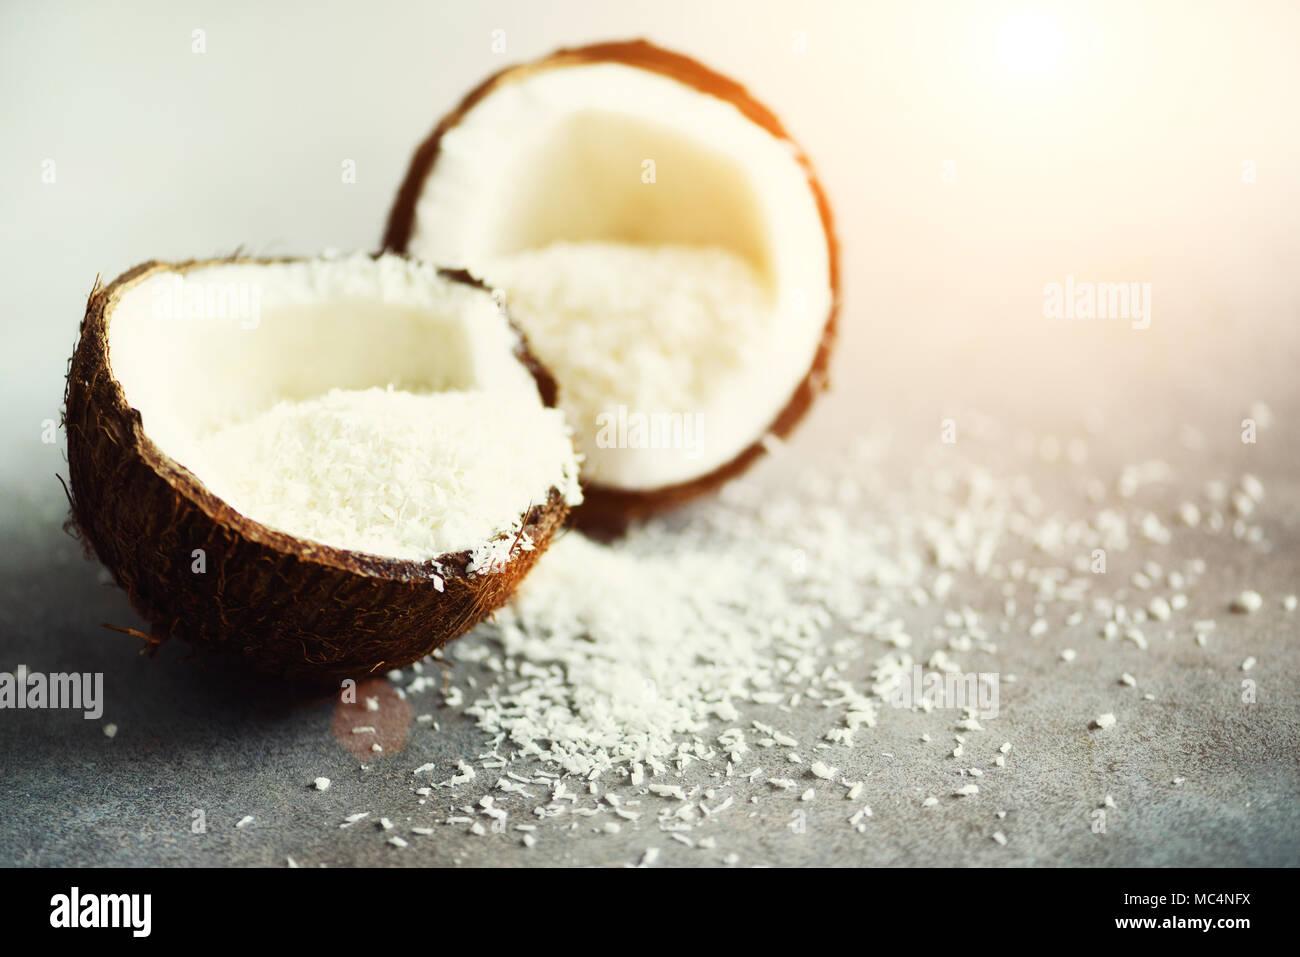 Coconut fuit halves with coconut shavings on grey concrete background. Copyspace - Stock Image